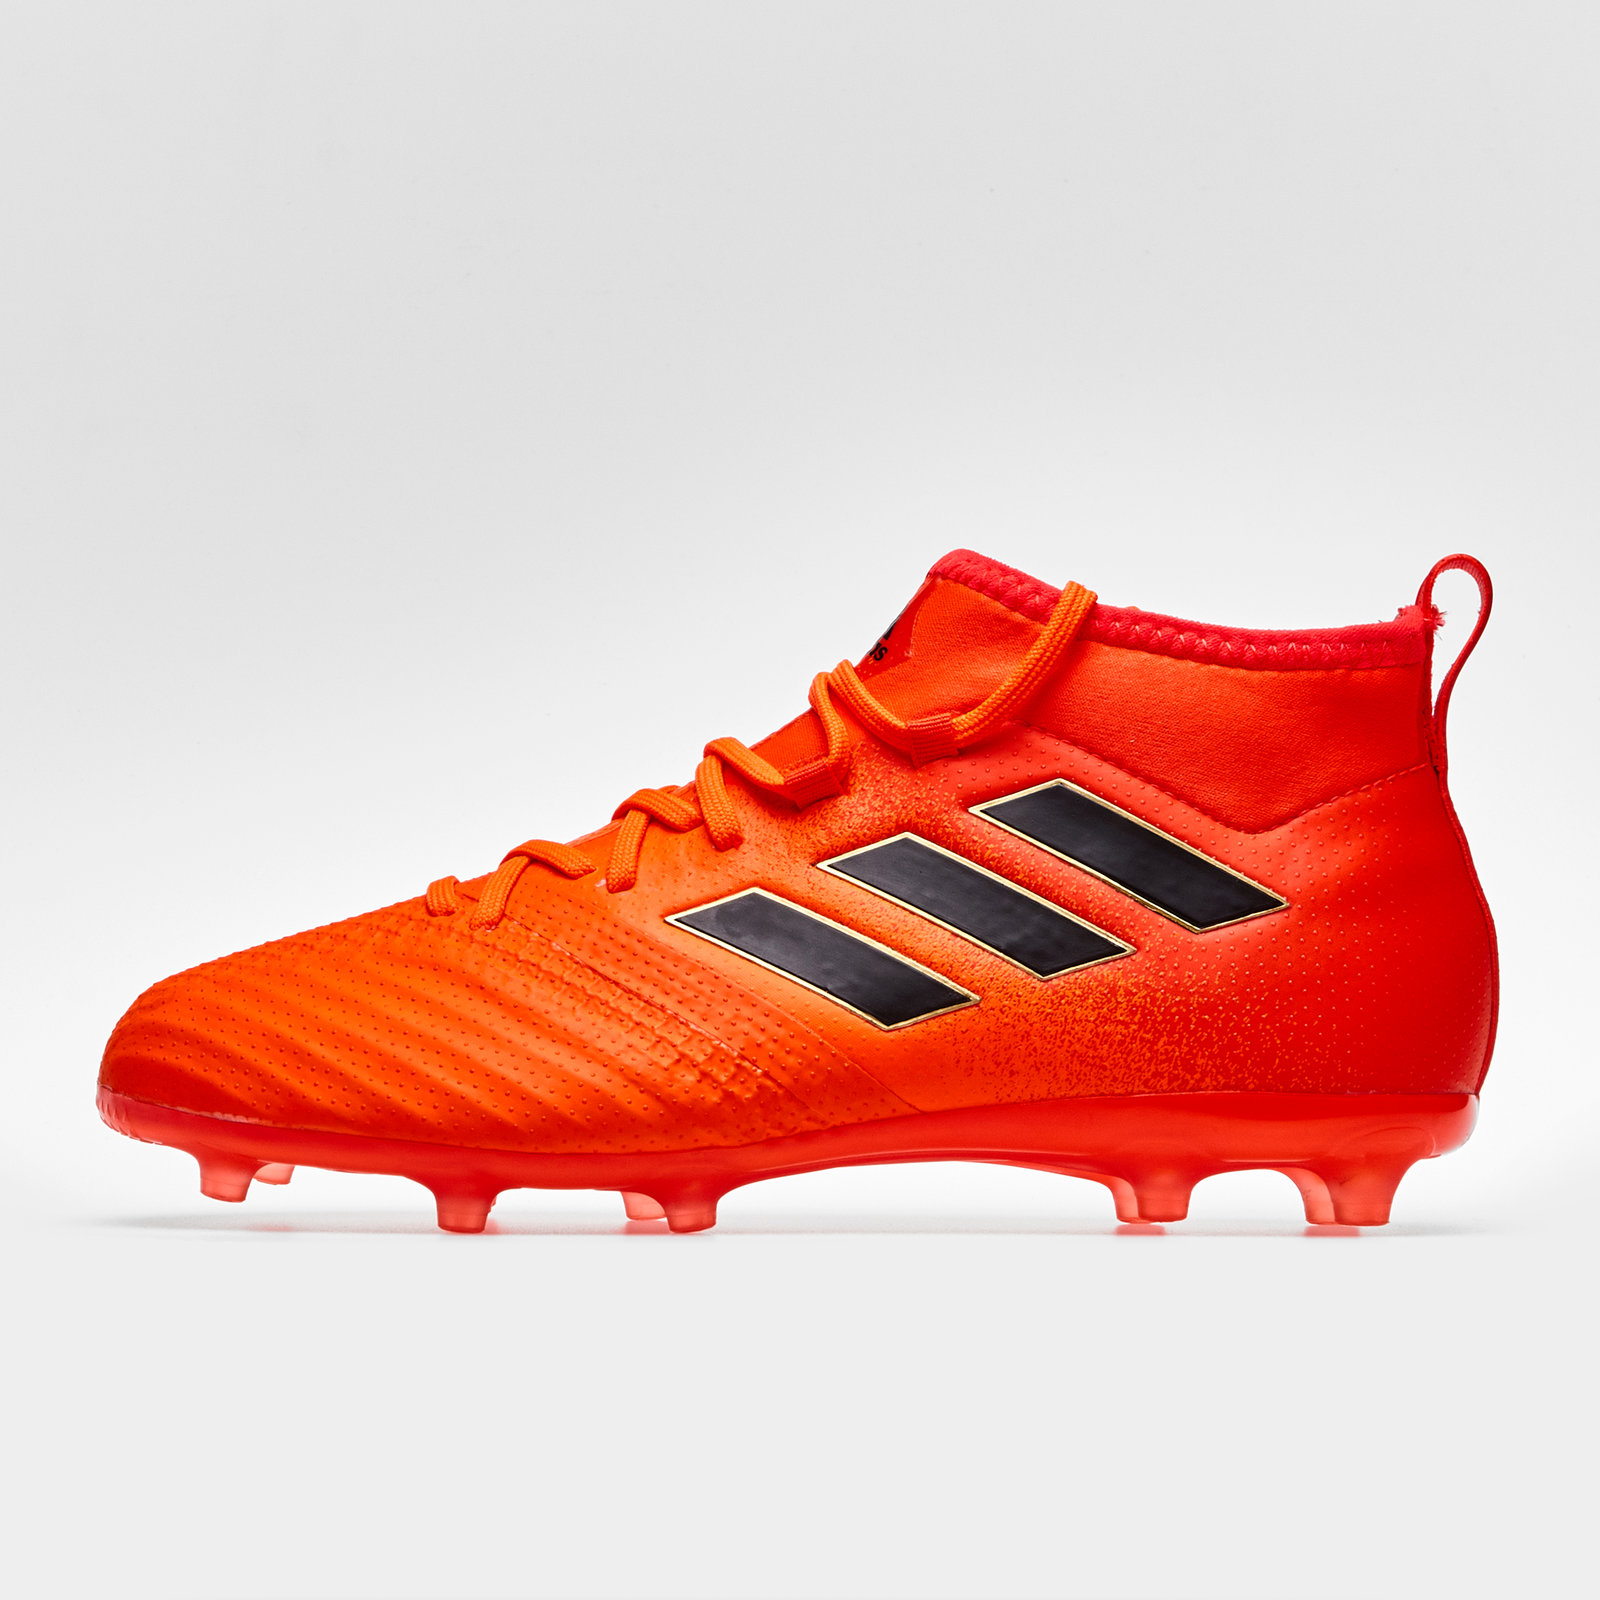 5edc2704e1383 ... usa adidas ace 17.1 fg kids football boots 9b511 c7734